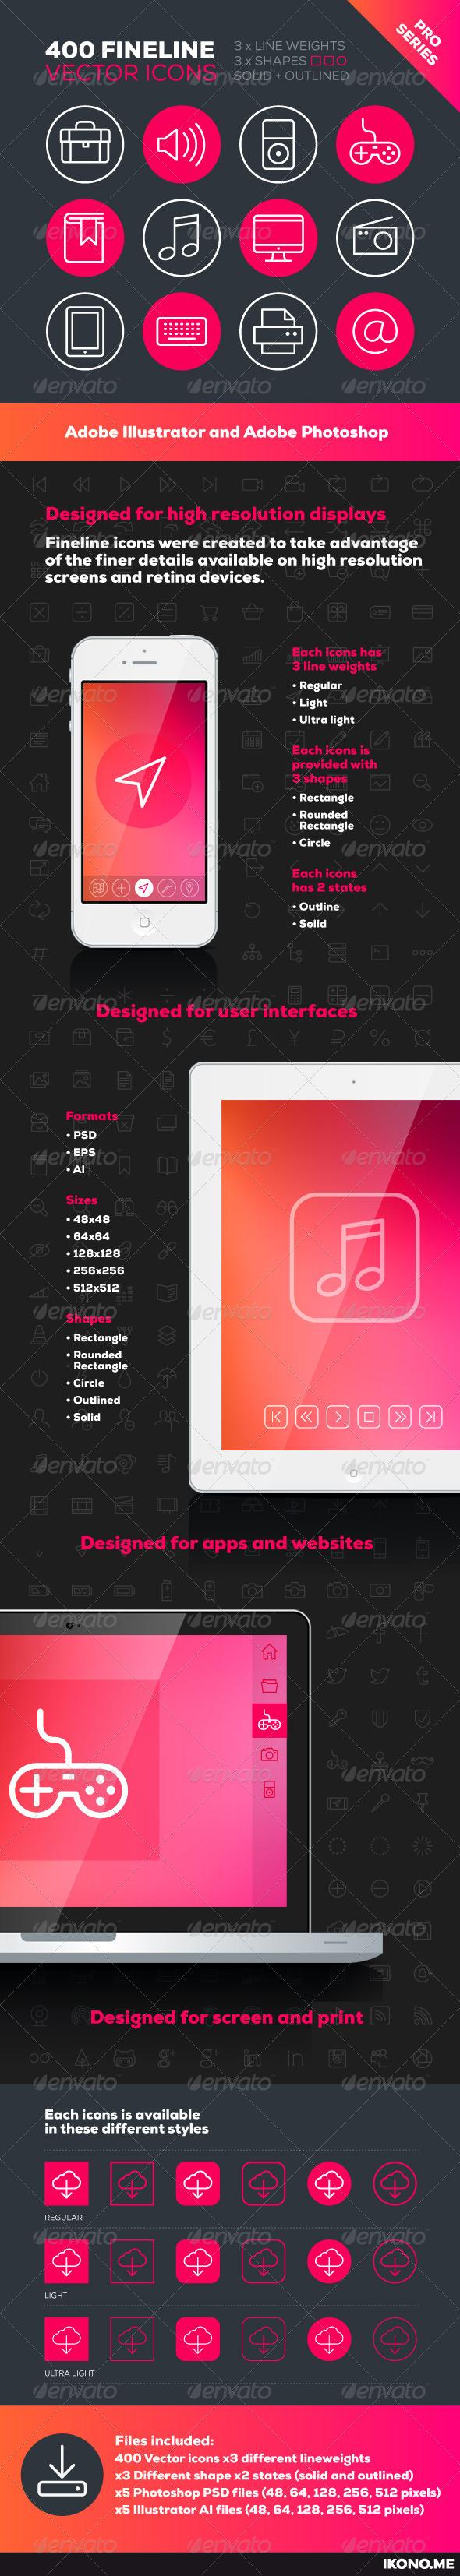 GraphicRiver 400 Fineline Icons 5553230